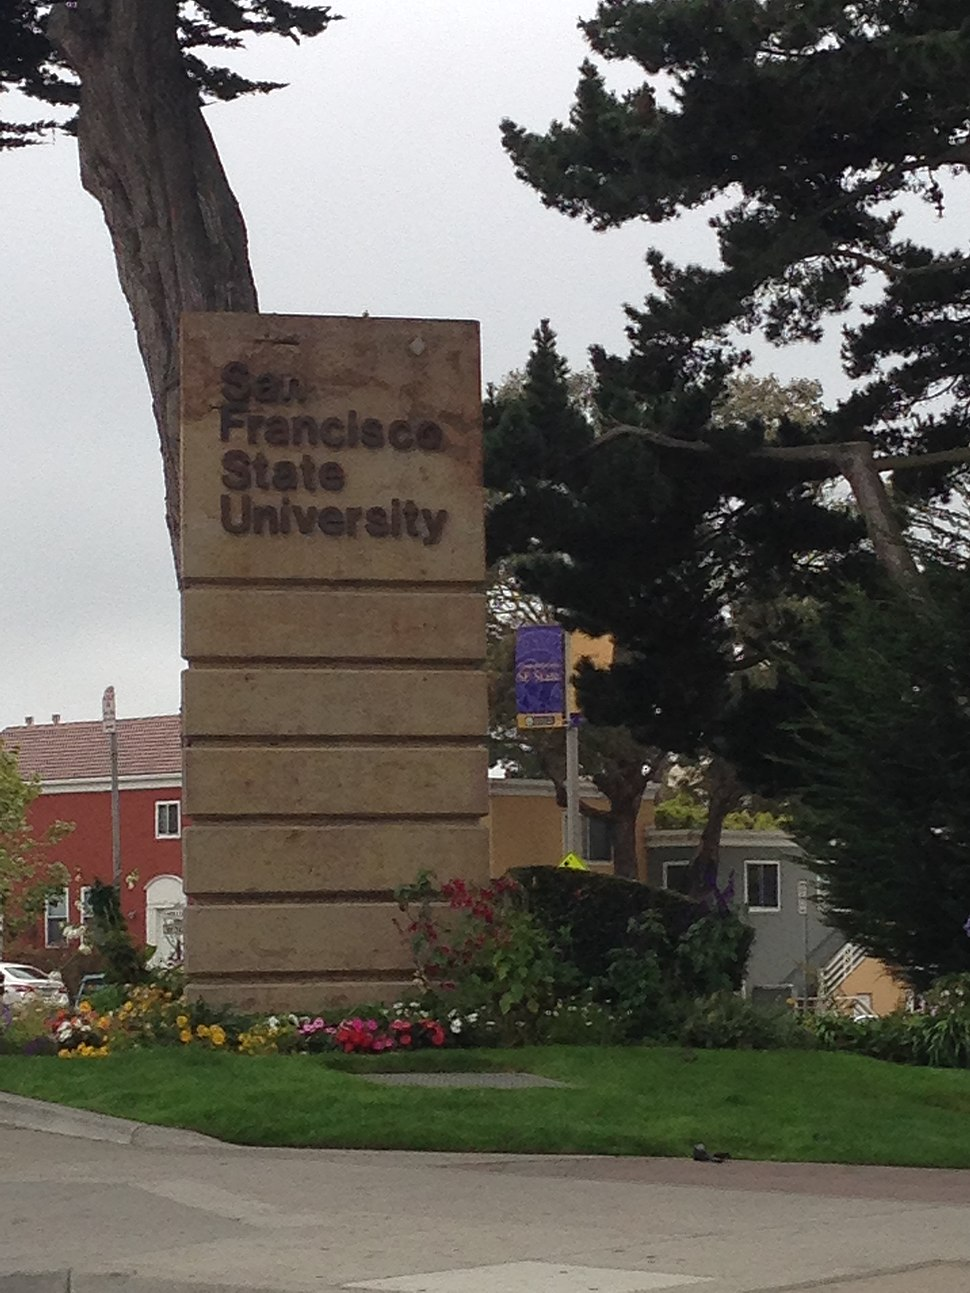 San Francisco State University sign